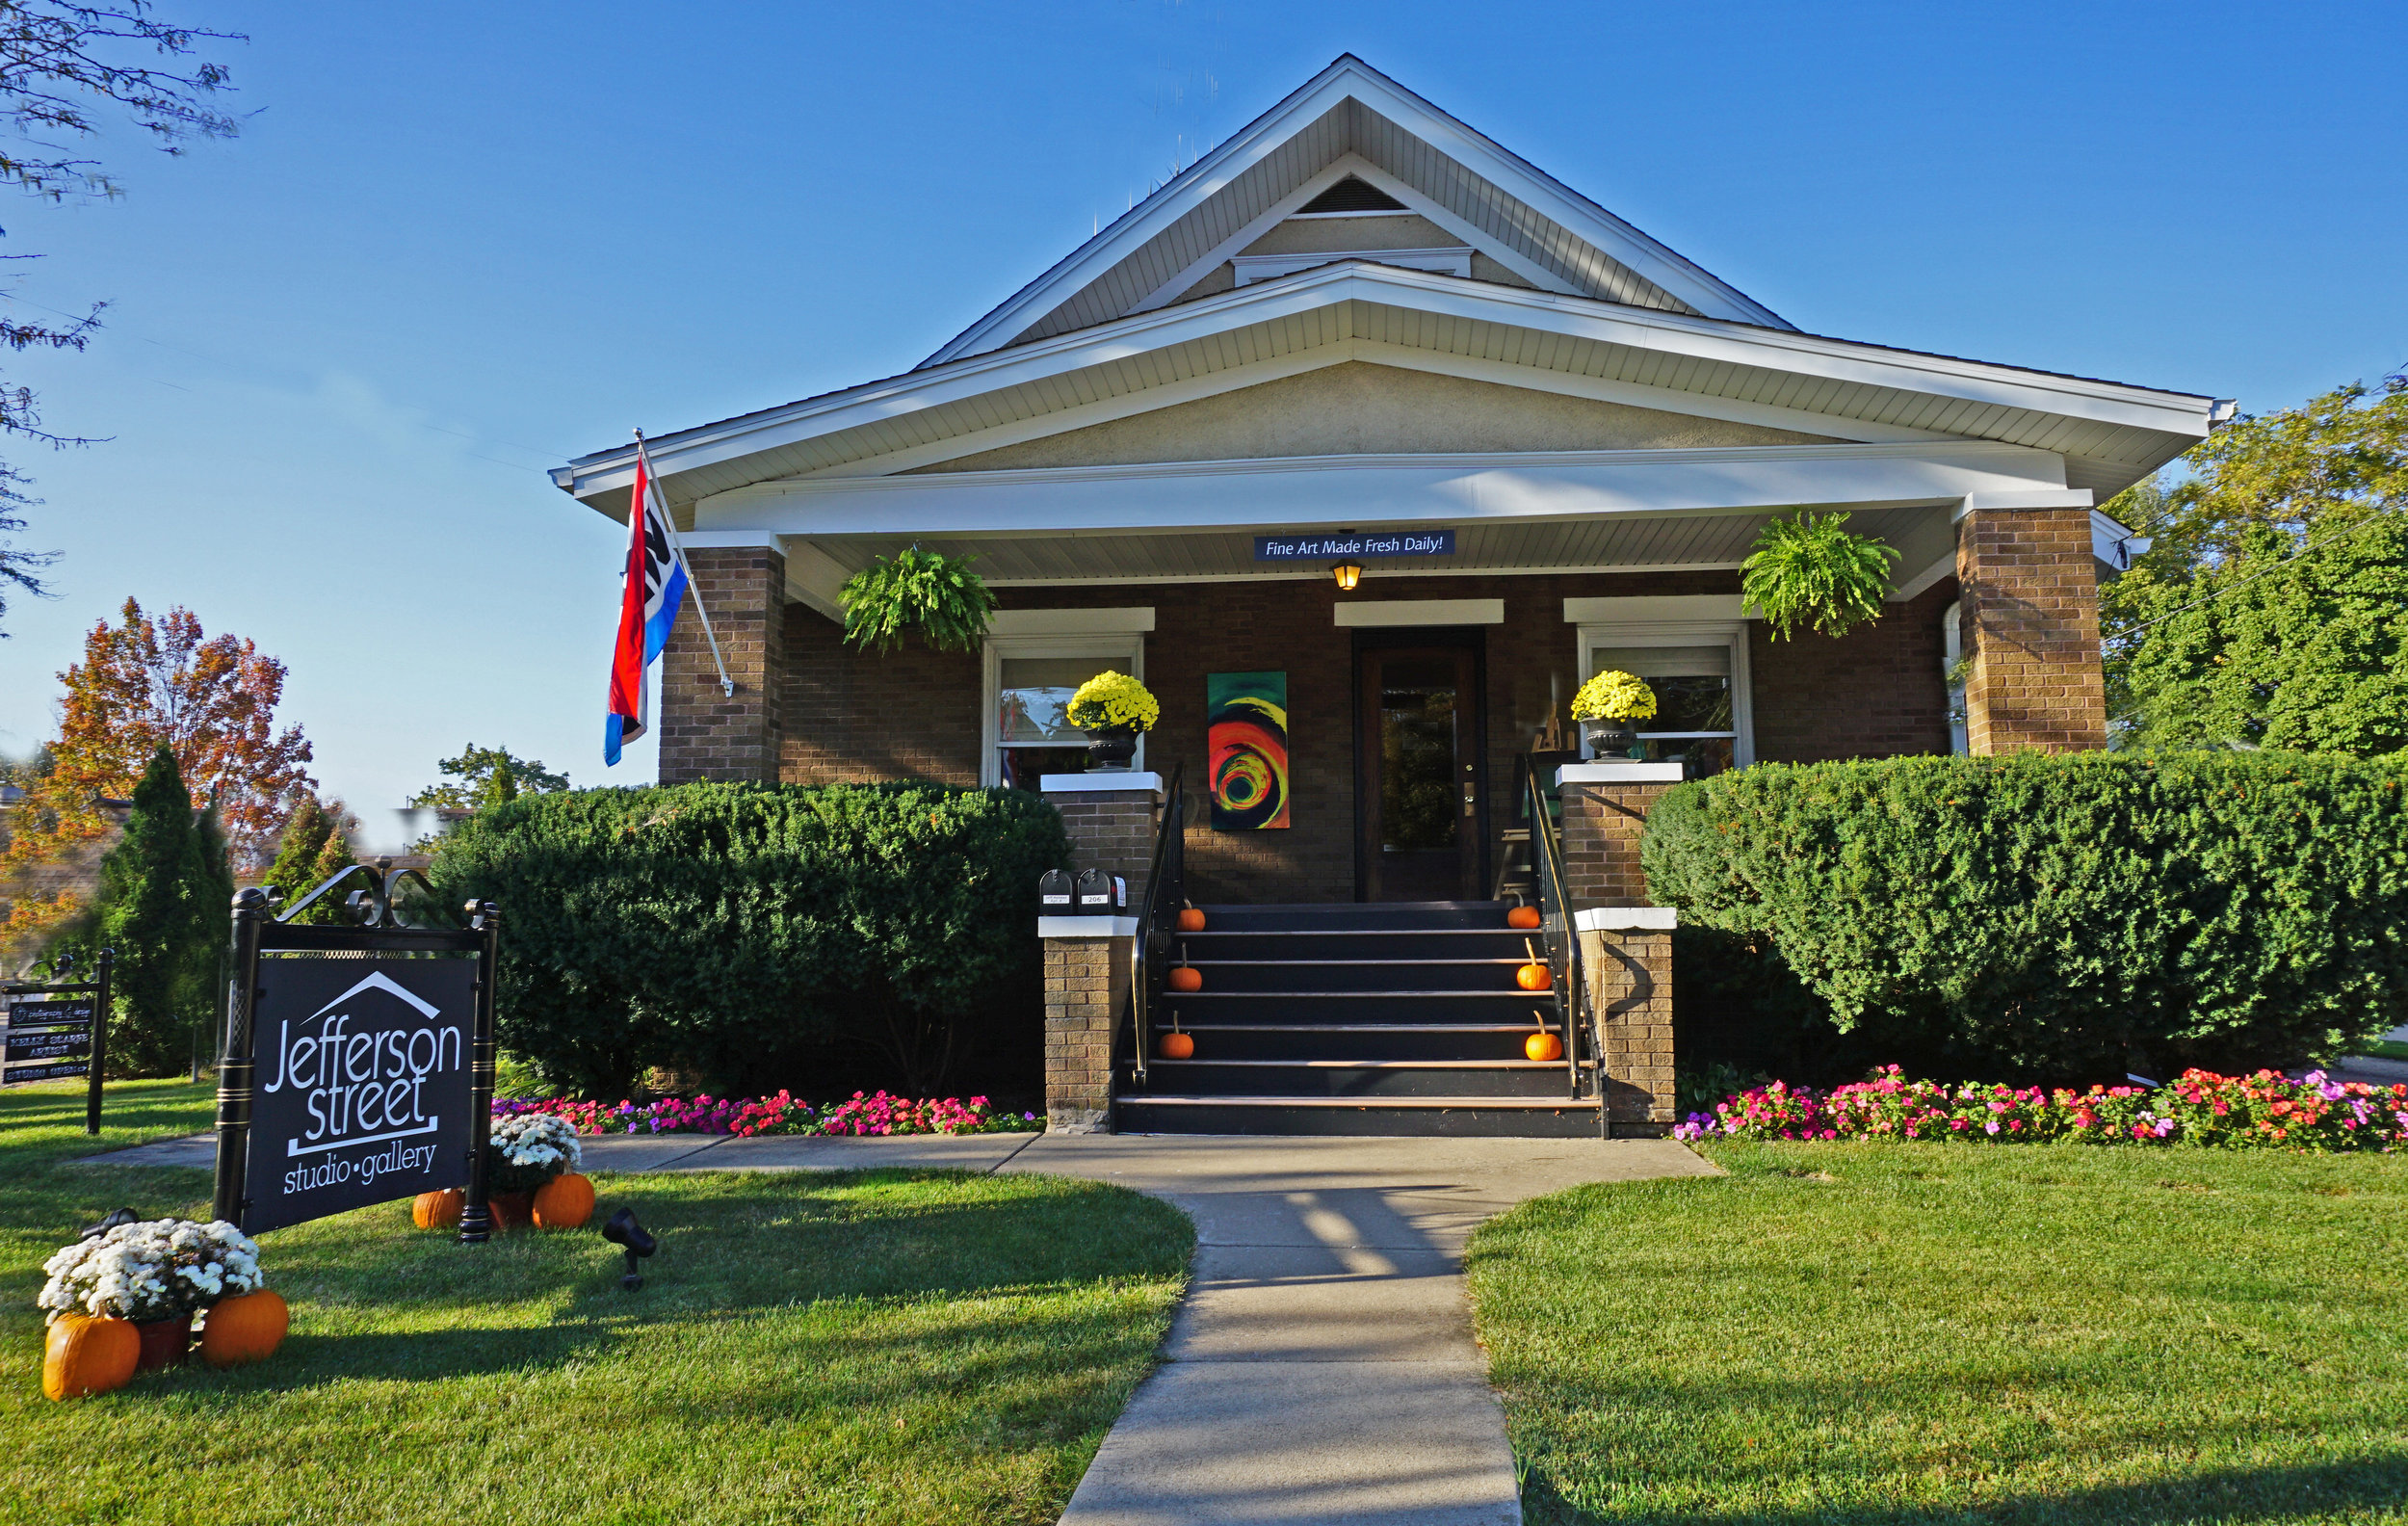 Jefferson Street Studio and Gallery, 206 Jefferson Street